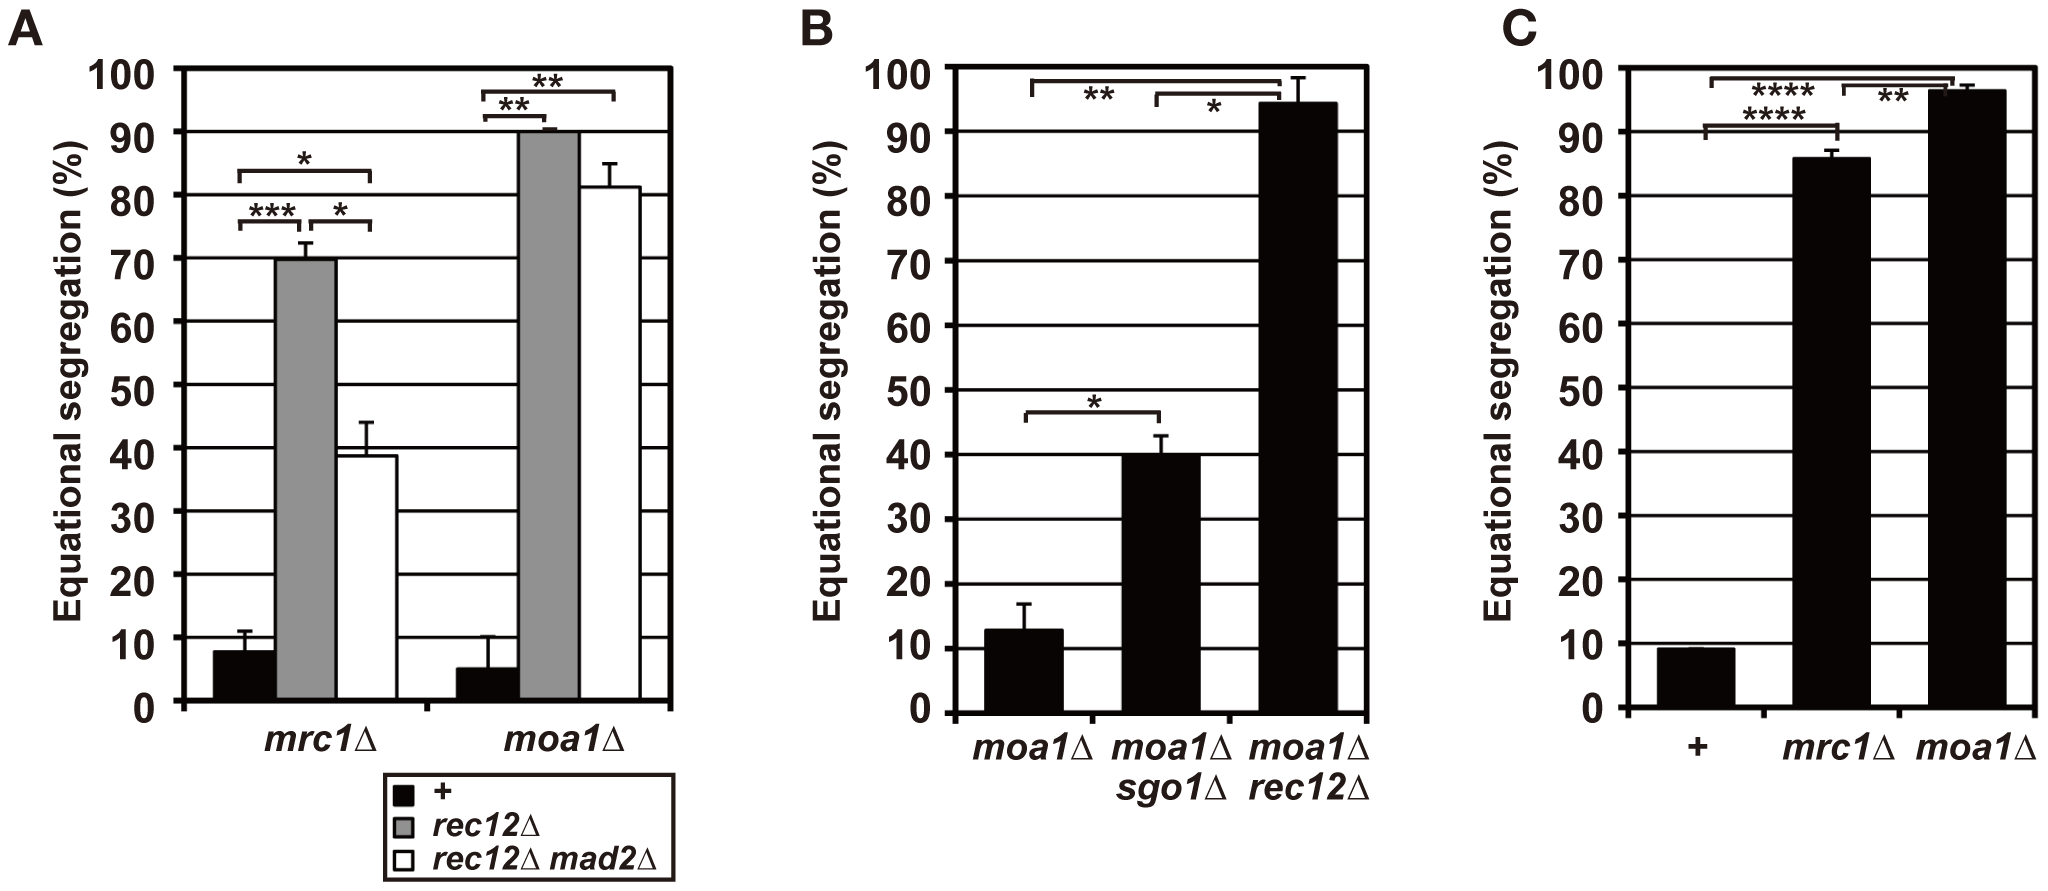 Sister chromatid segregation in <i>mrc1</i> and <i>moa1</i> mutants.